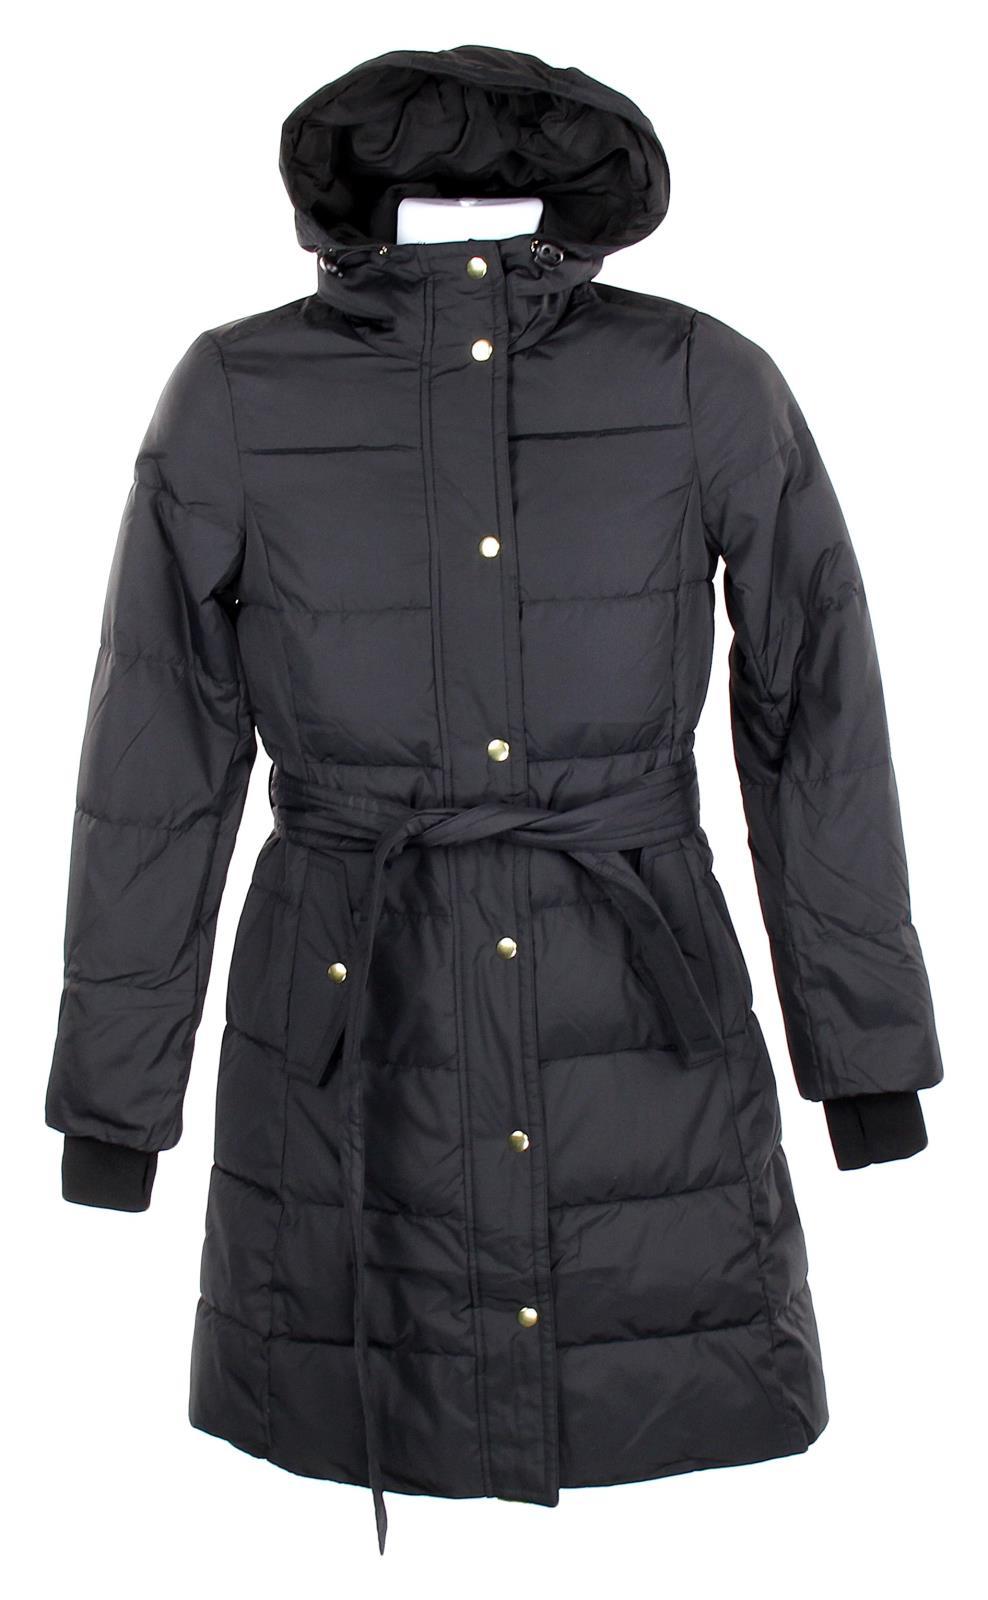 6ced690eb Details about J Crew Mercantile Women's Tie-Waist Puffer Coat Black Winter  Coat XXS K4208